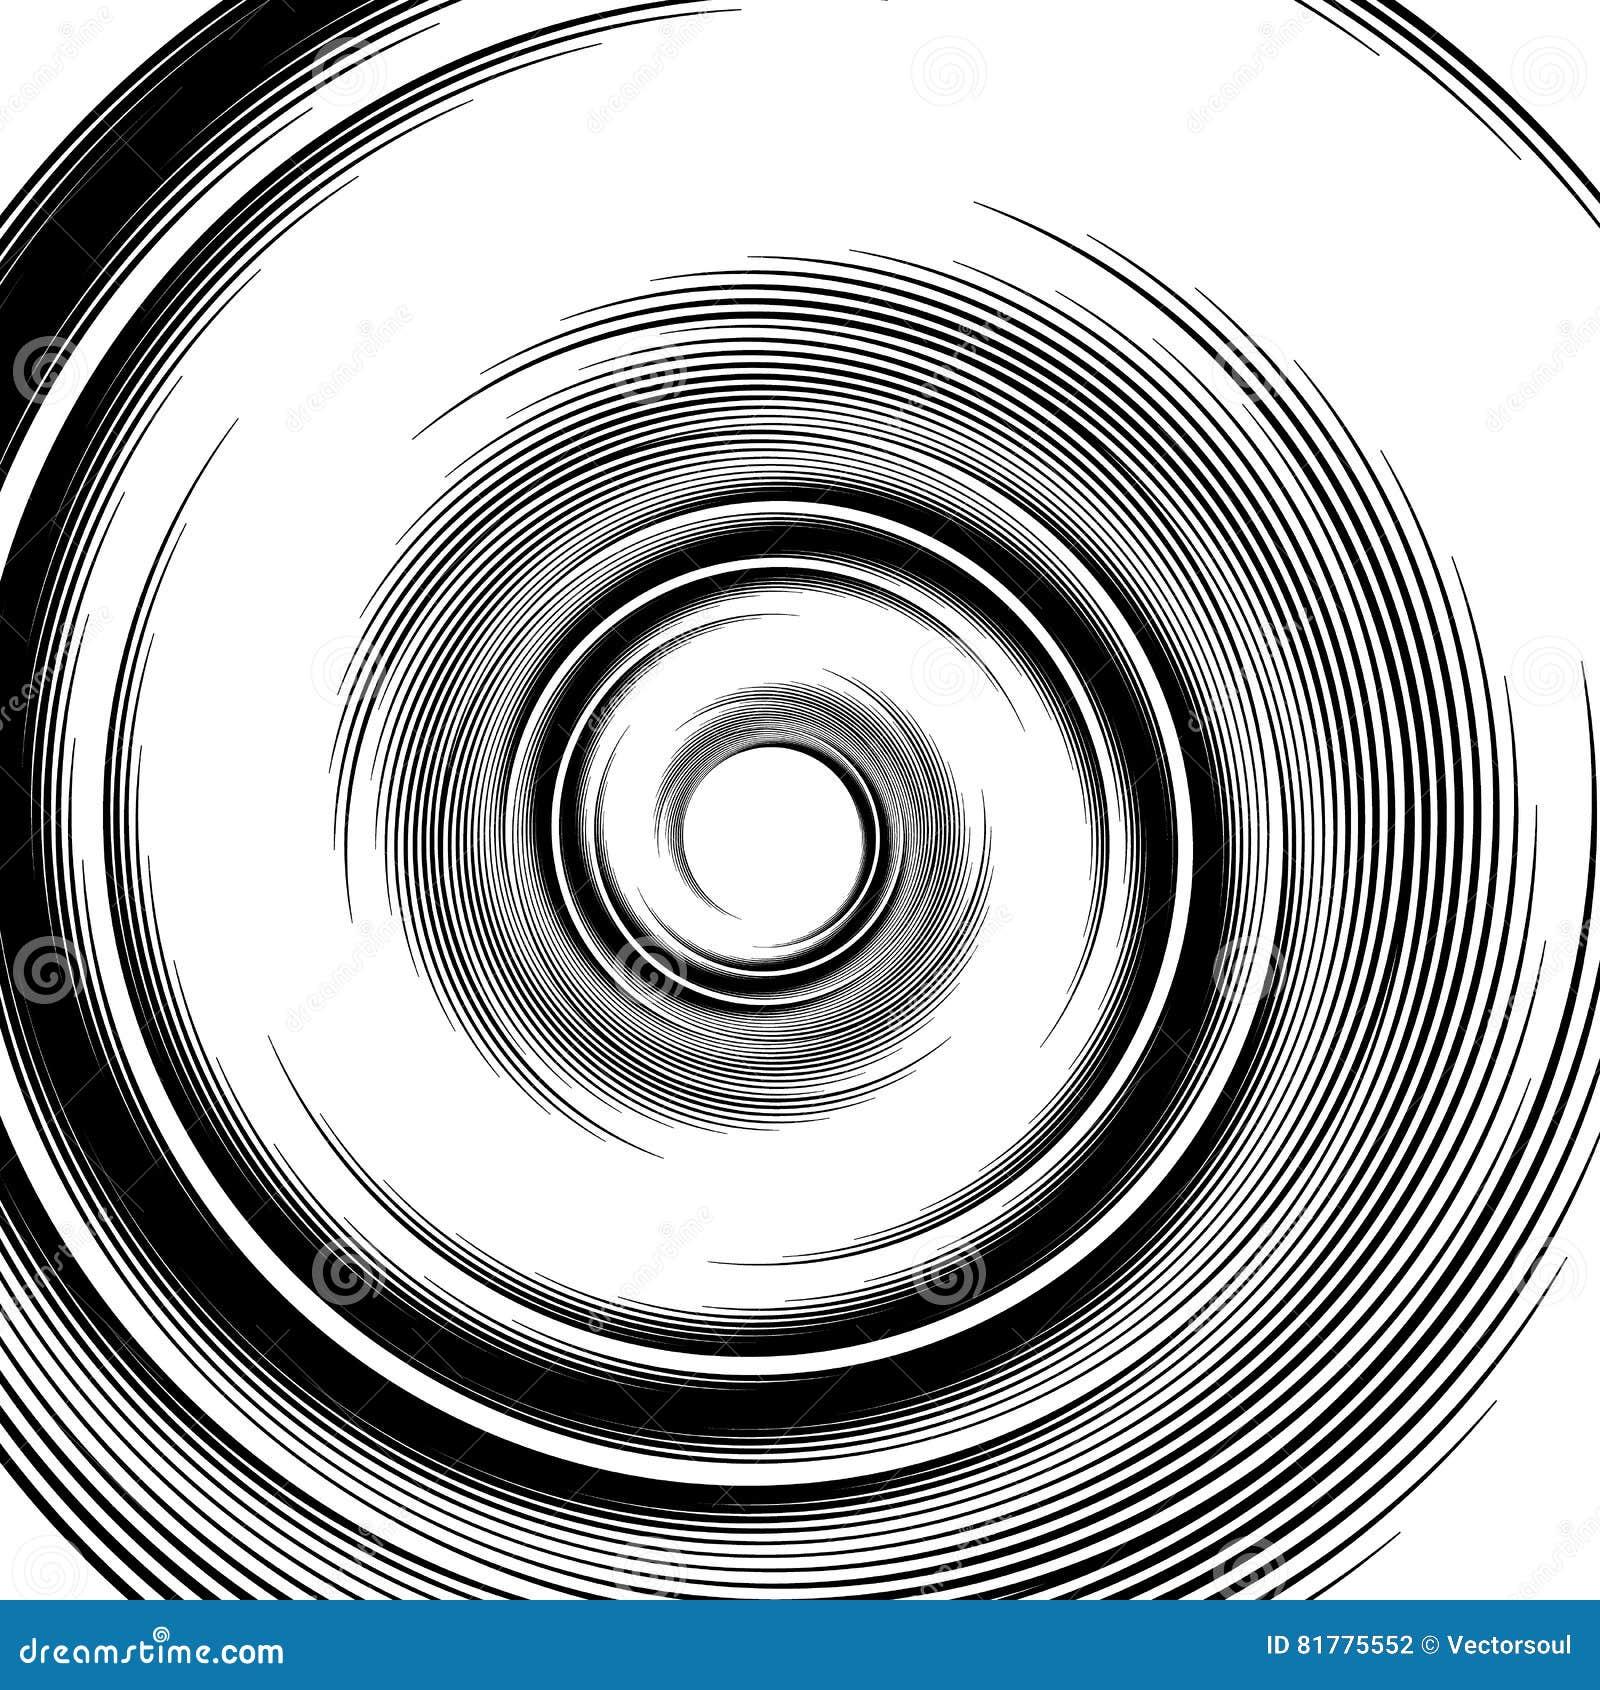 Spiraalvormig patroon Draaikolk, volute visueel effect - Abstracte monochro